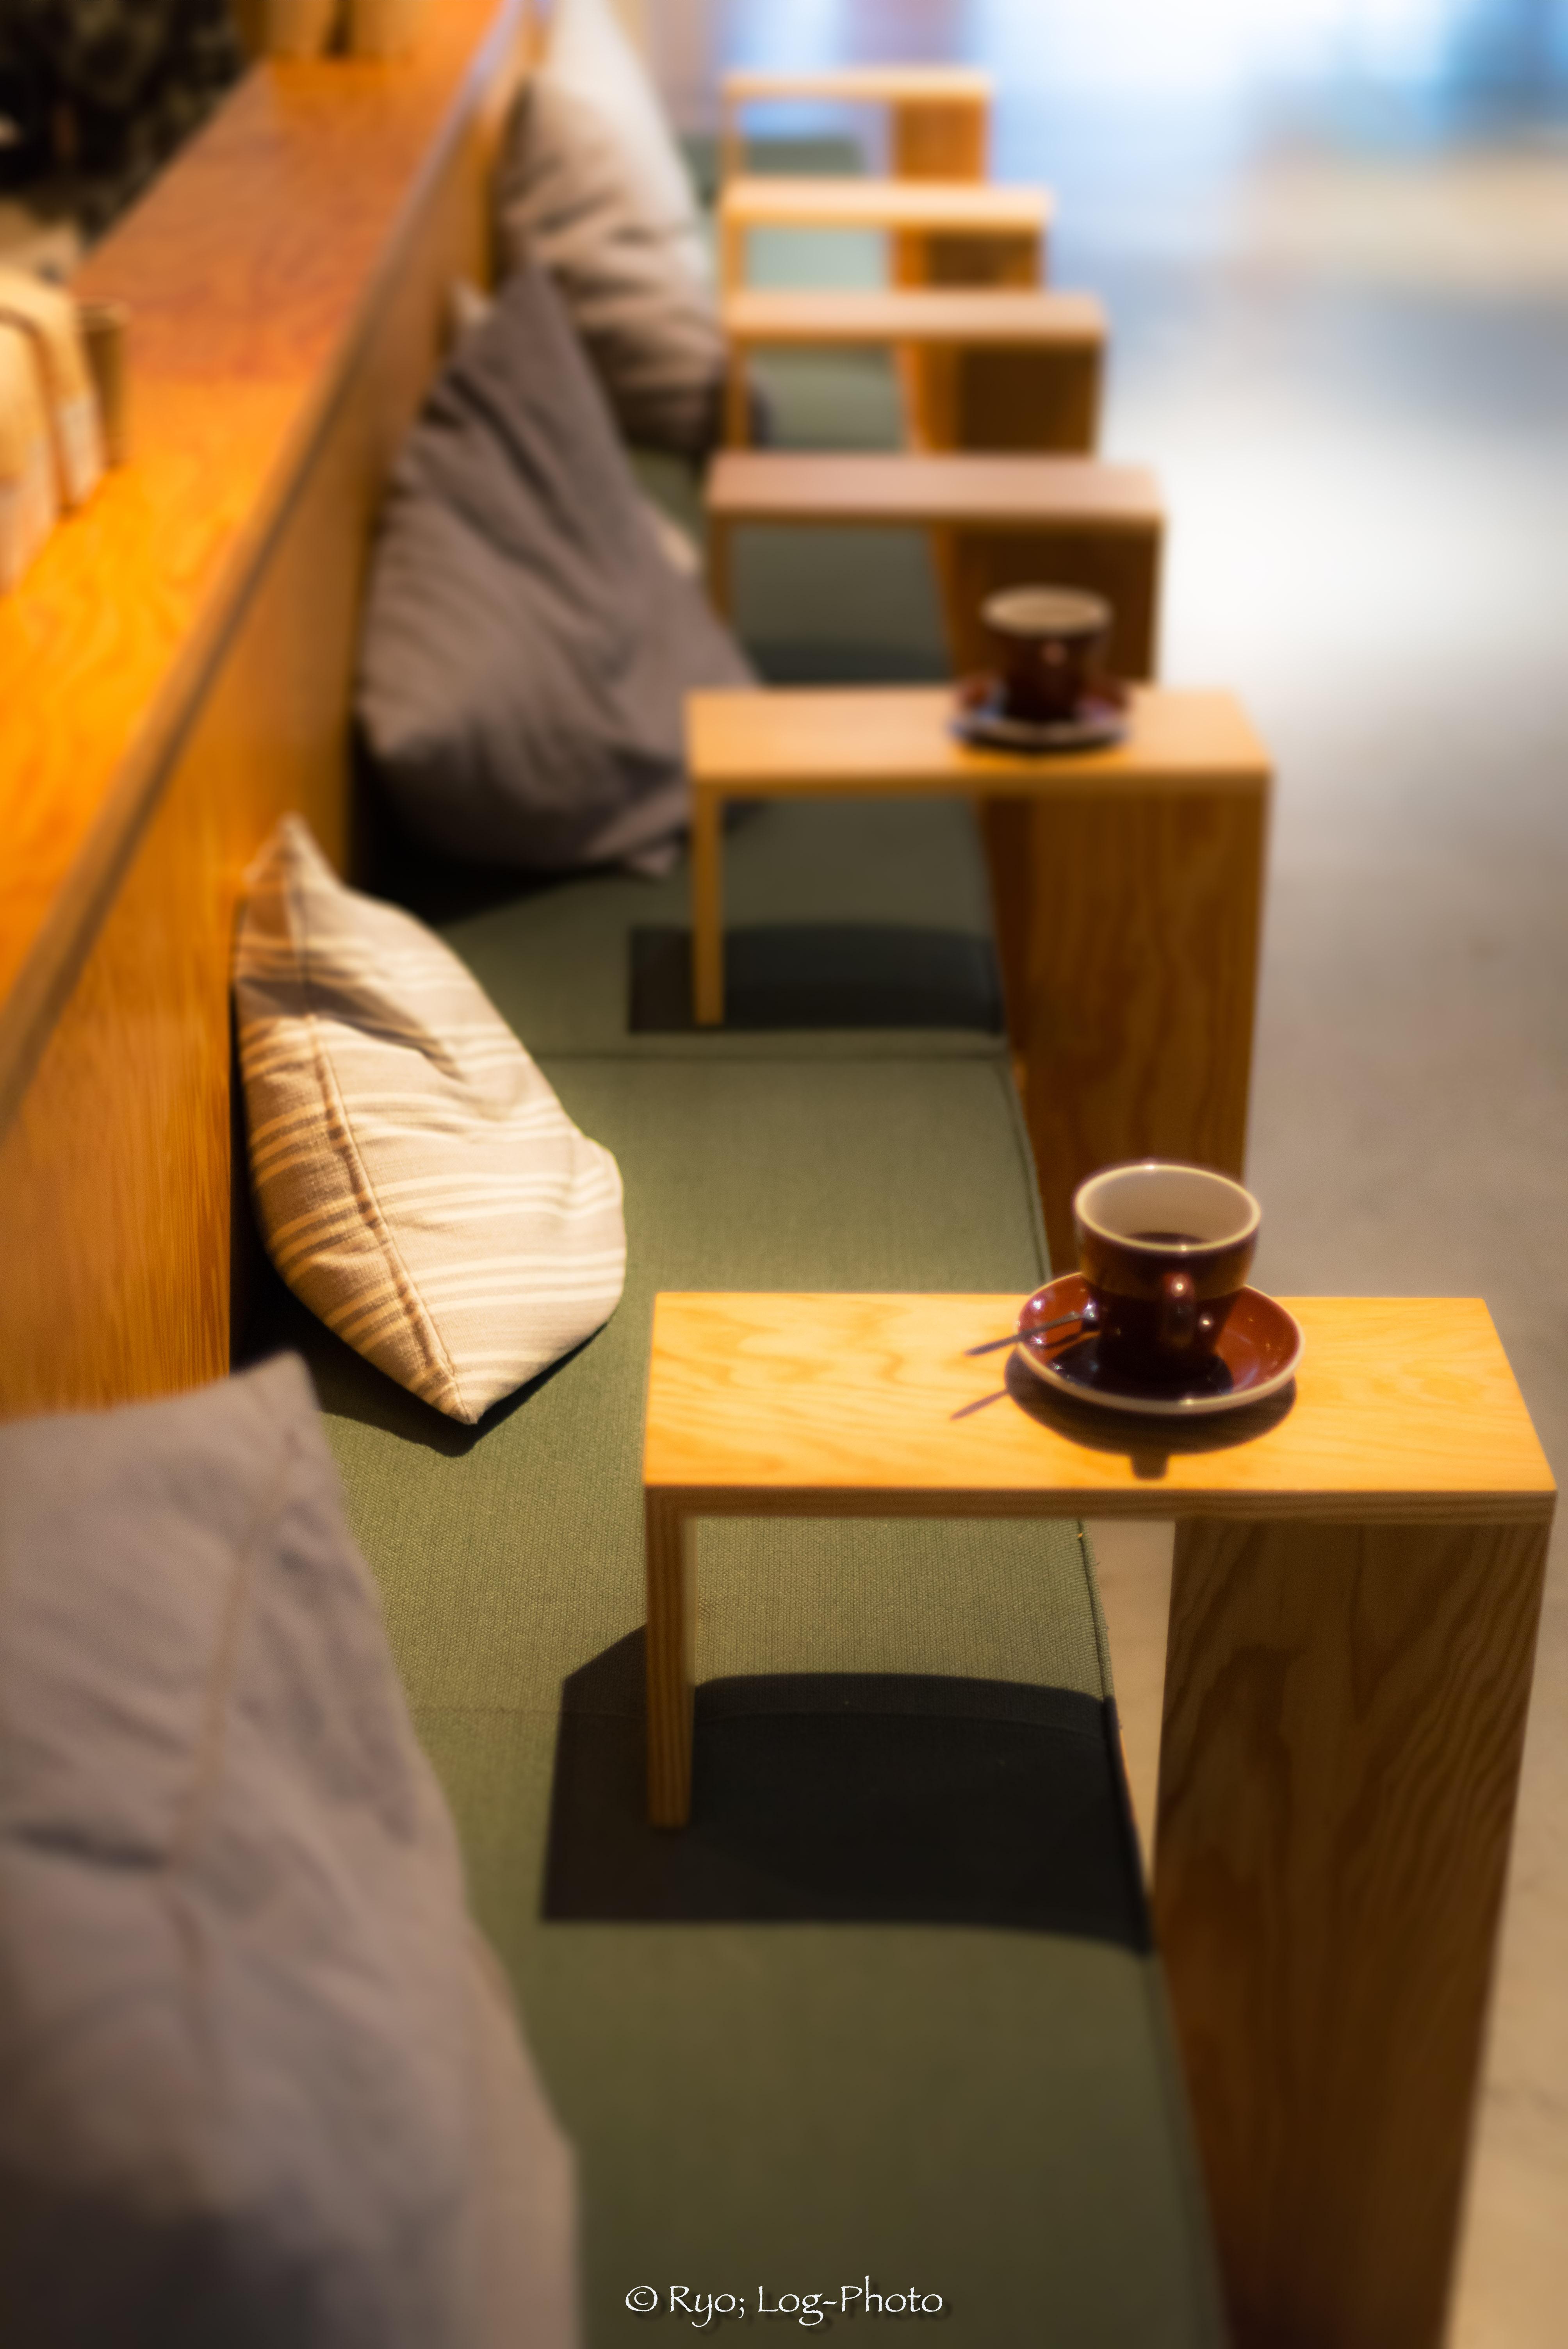 nozycoffee ノージーコーヒー 木更津 カフェ